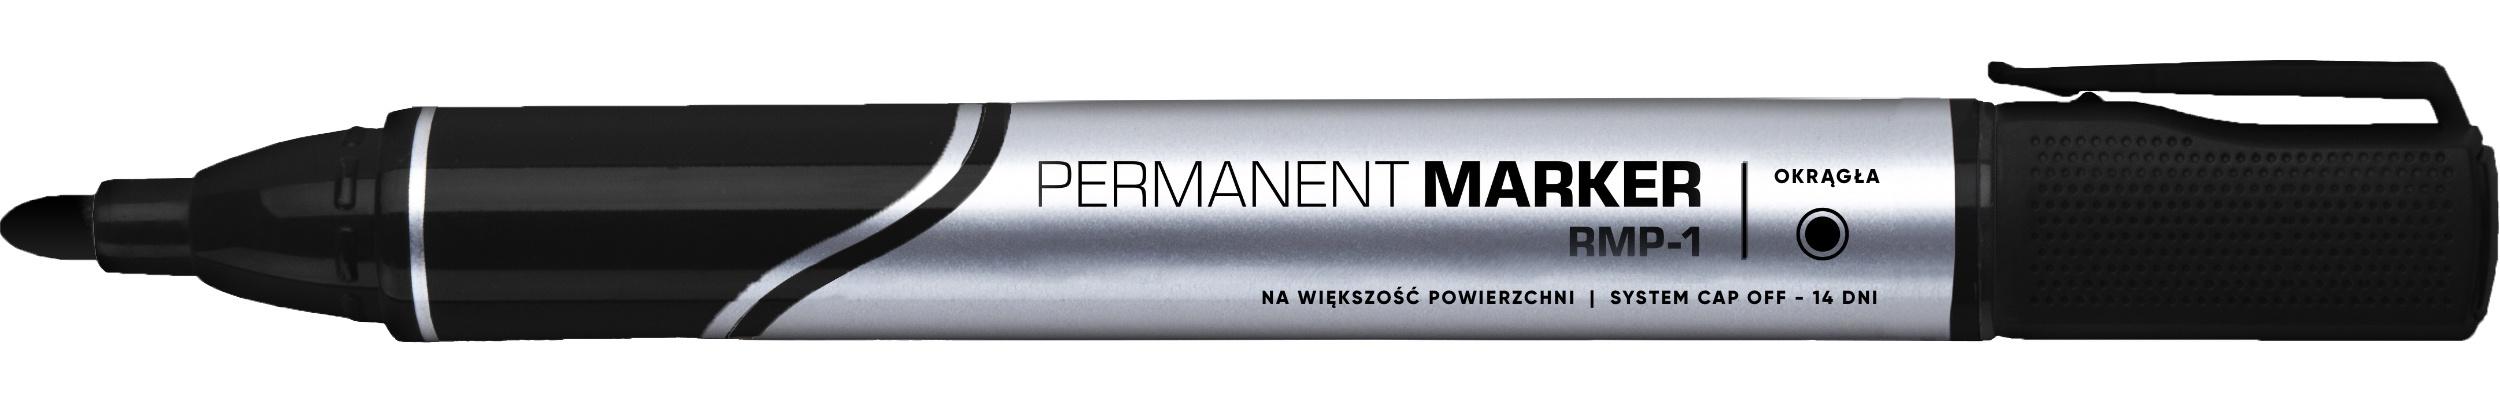 Marker permanentny RMP-1